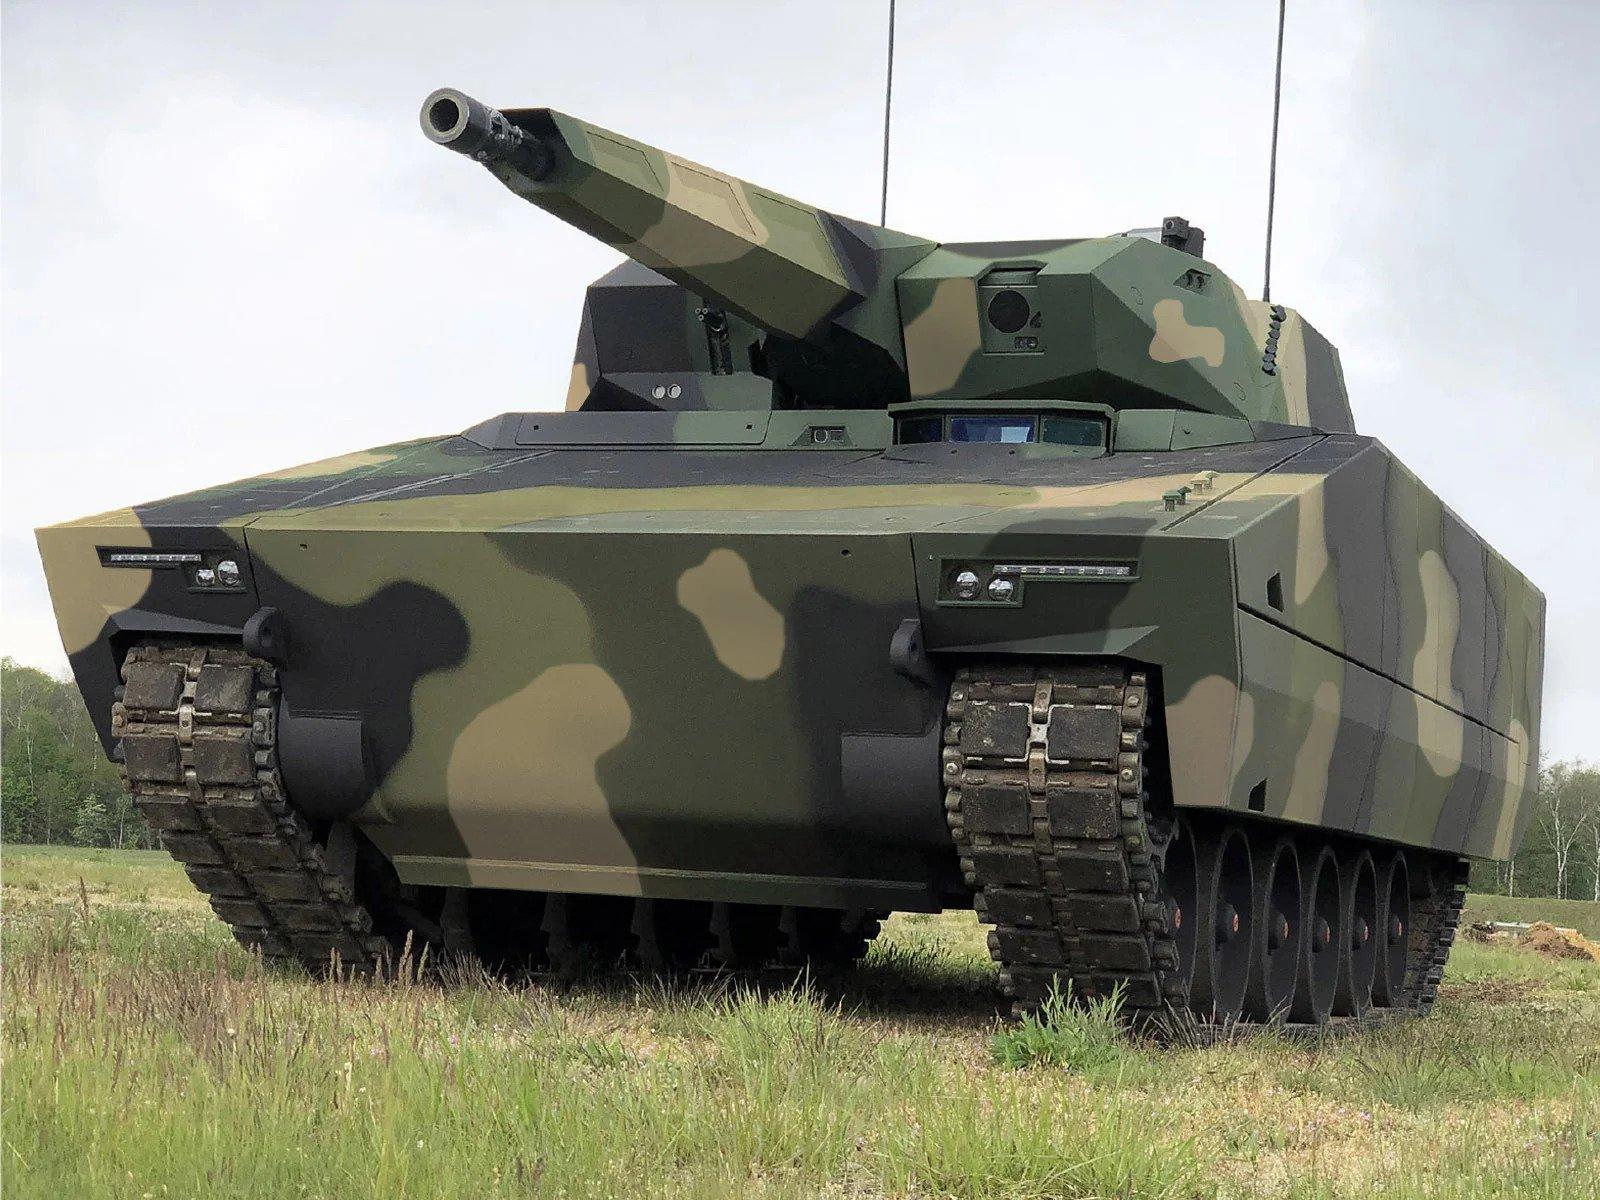 Rheinmetall Lynx